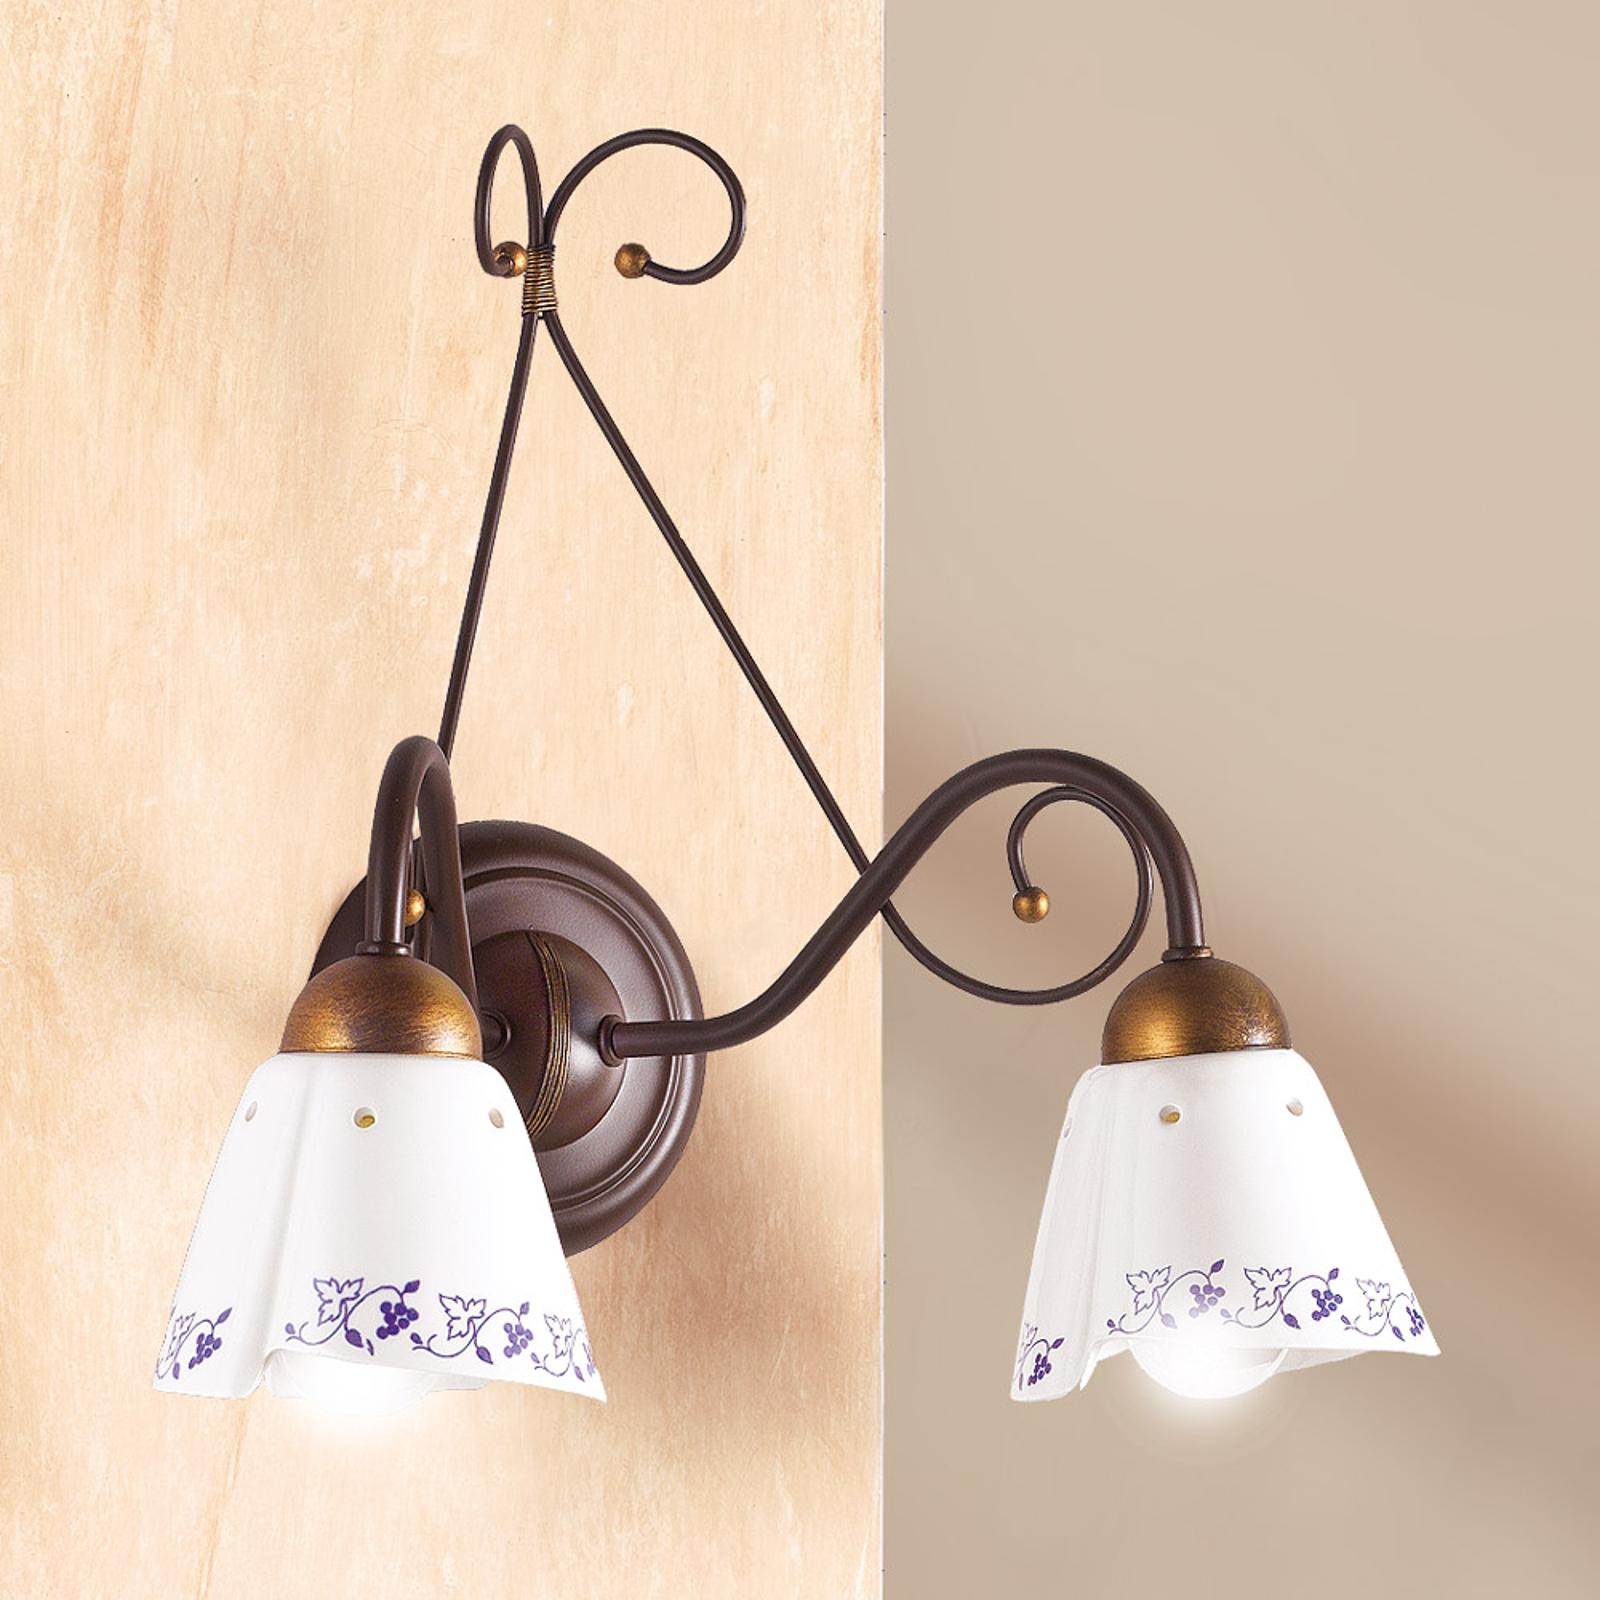 2-bulb CARTOCCIO wall light_2013041_1